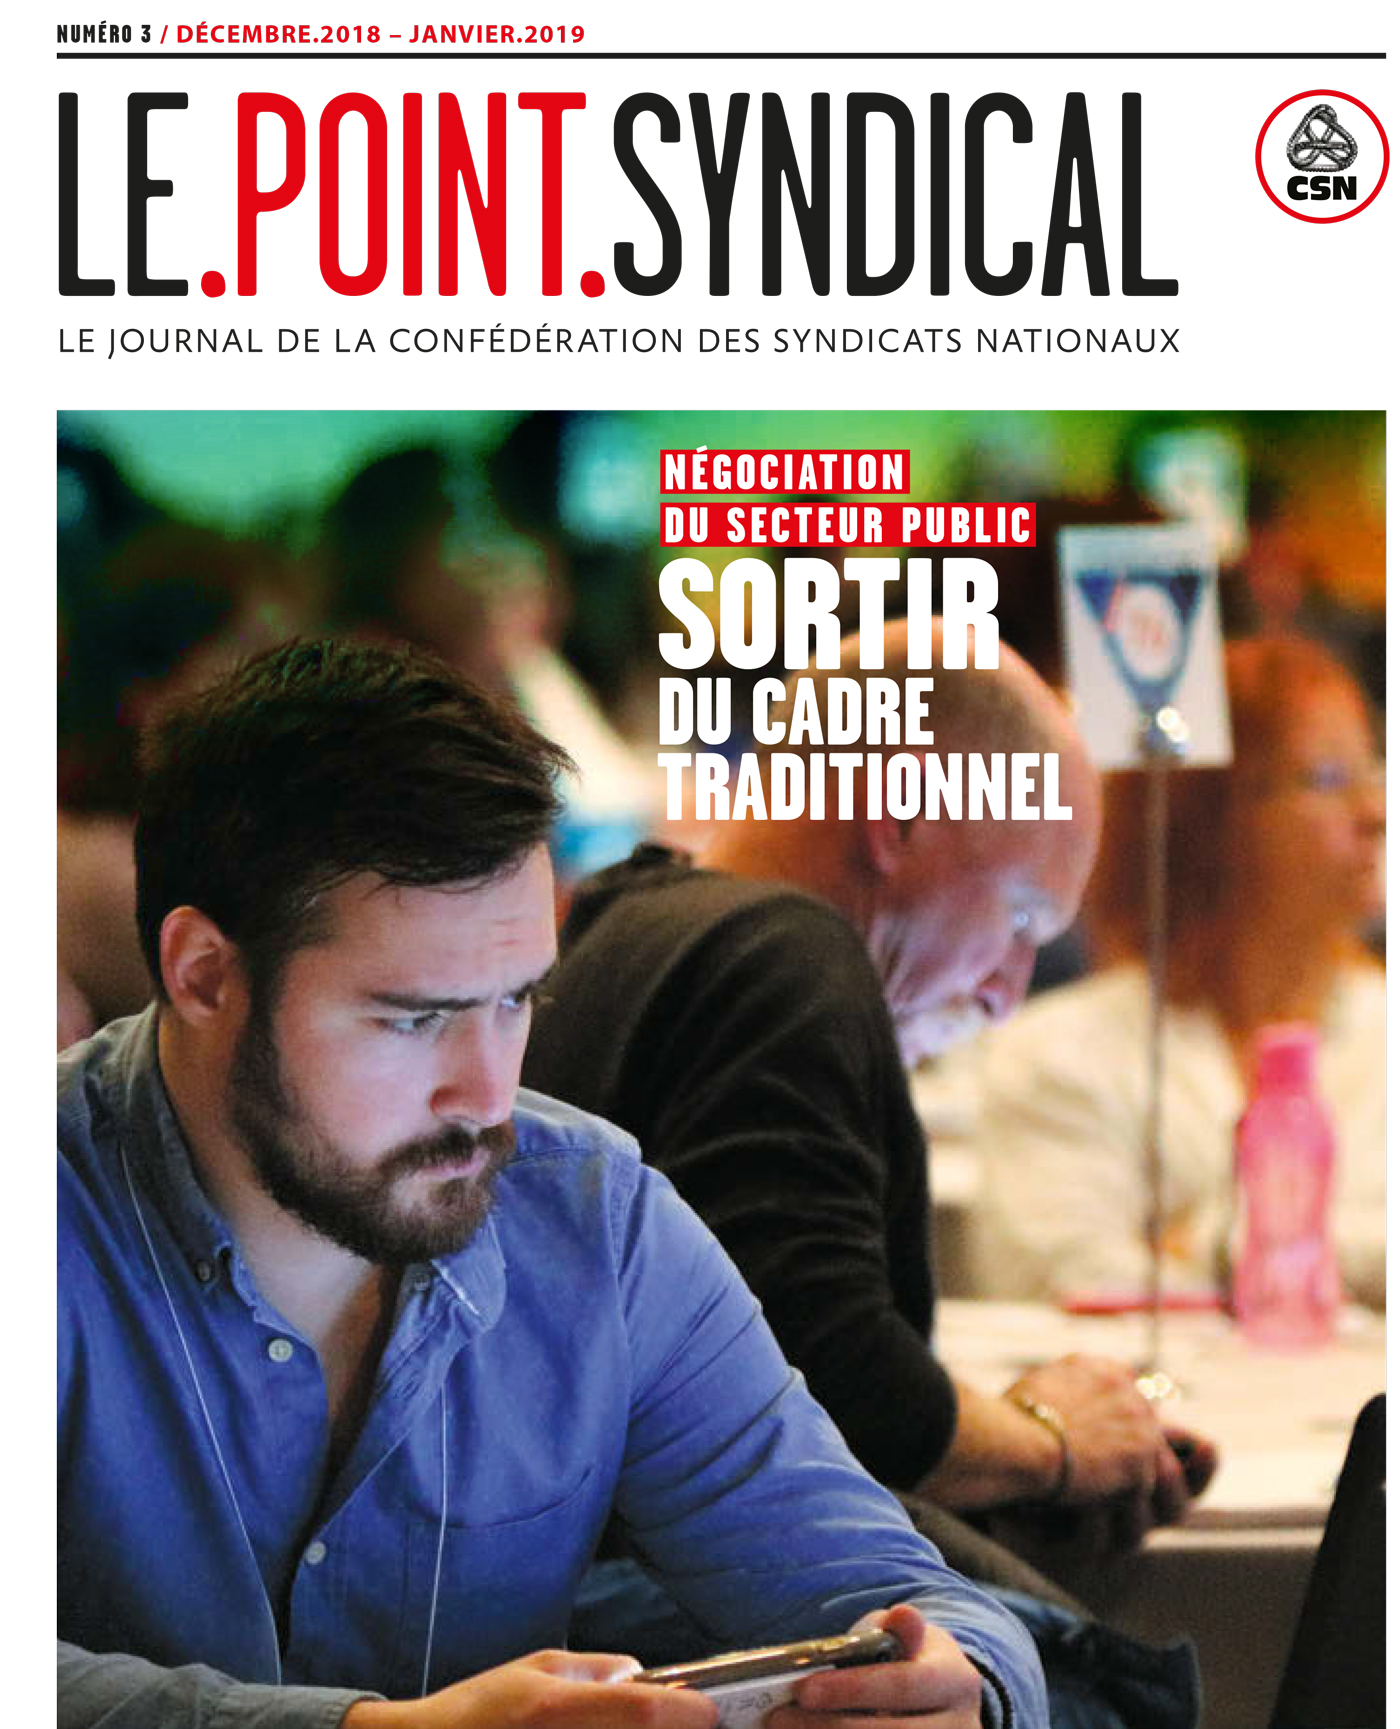 Le Point Syndical Numéro 3